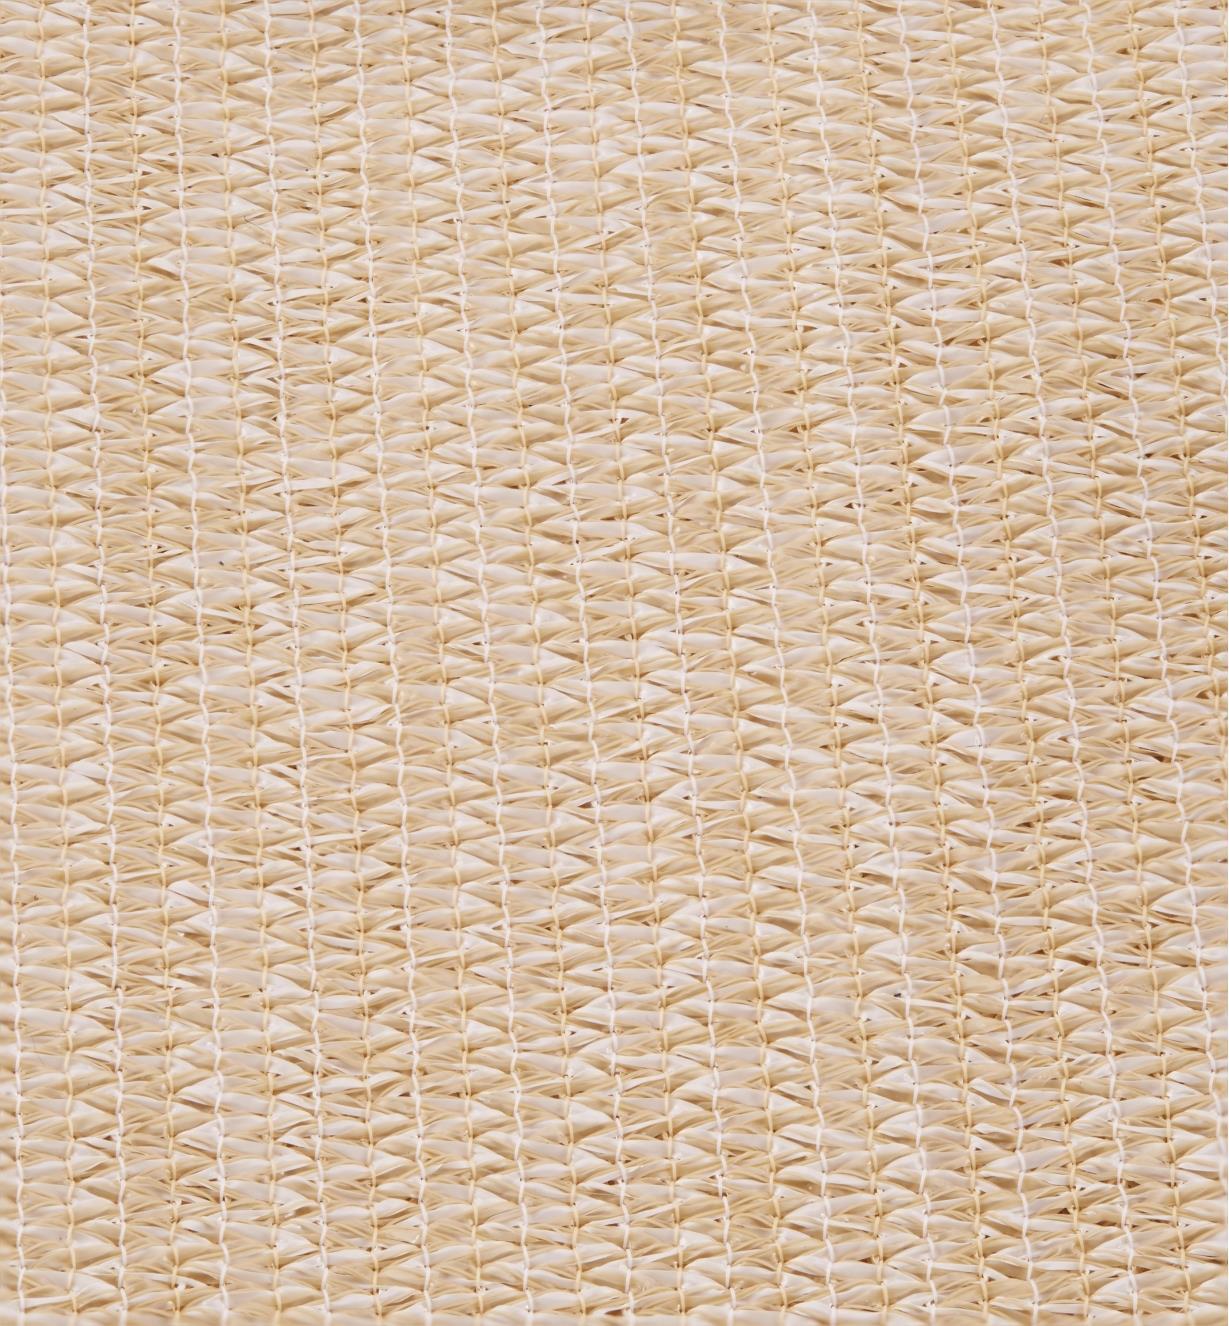 BL683 - Rectangle Shade Sail